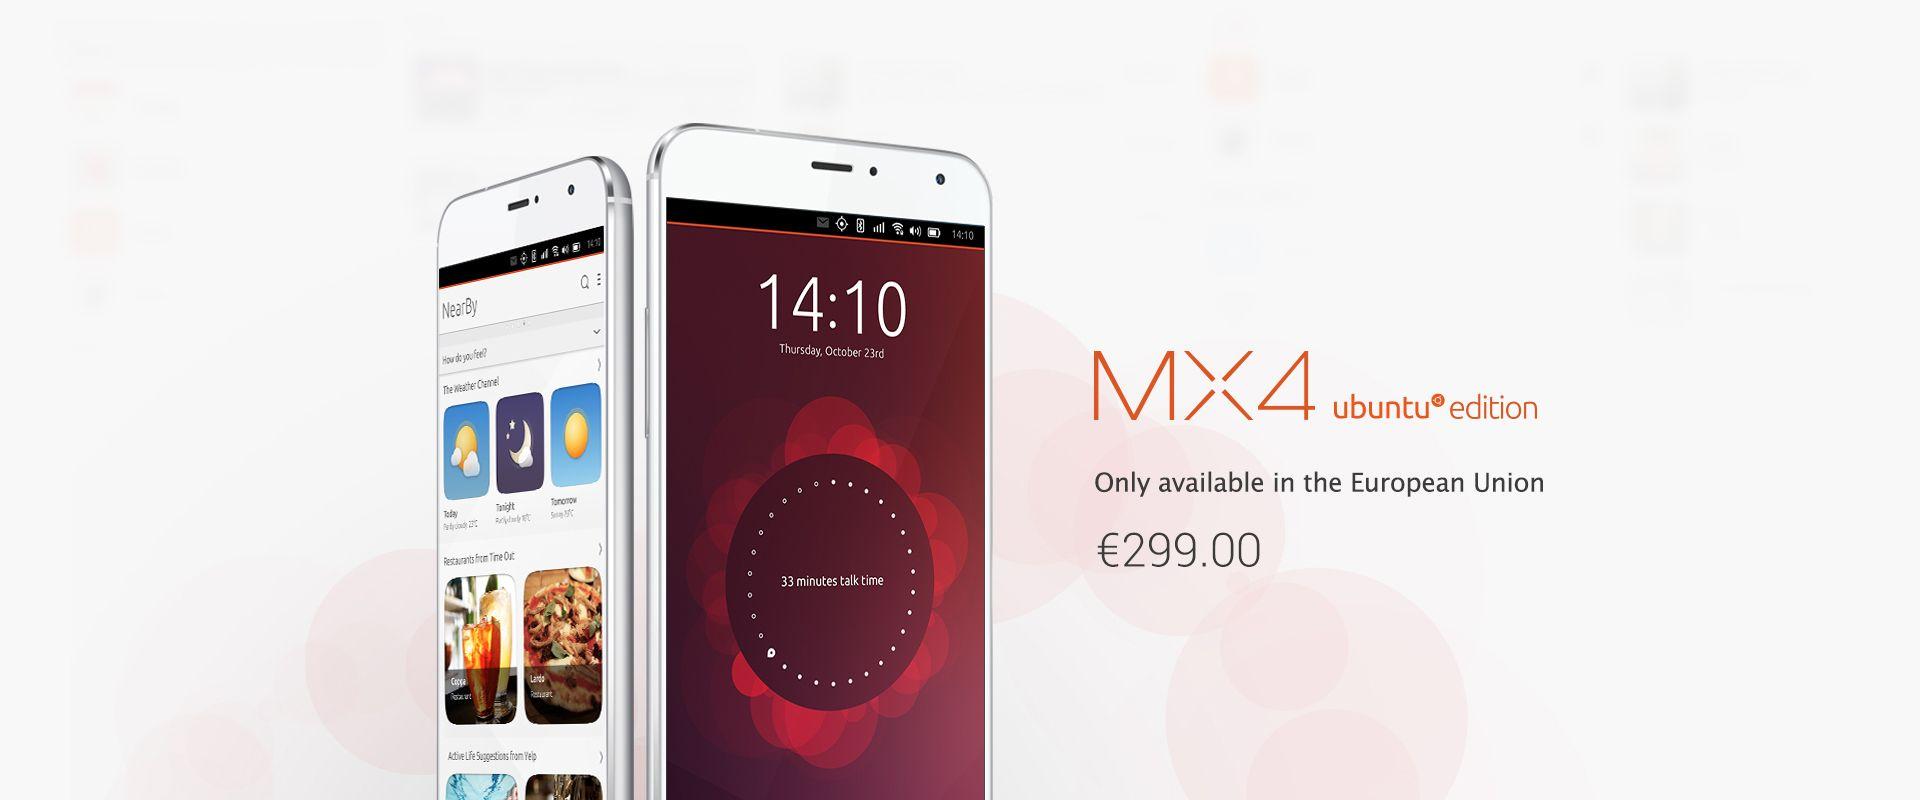 Meizu MX4 Ubuntu Editionが6/25限定で発売へ。既存のMeizu MX4との互換性は?